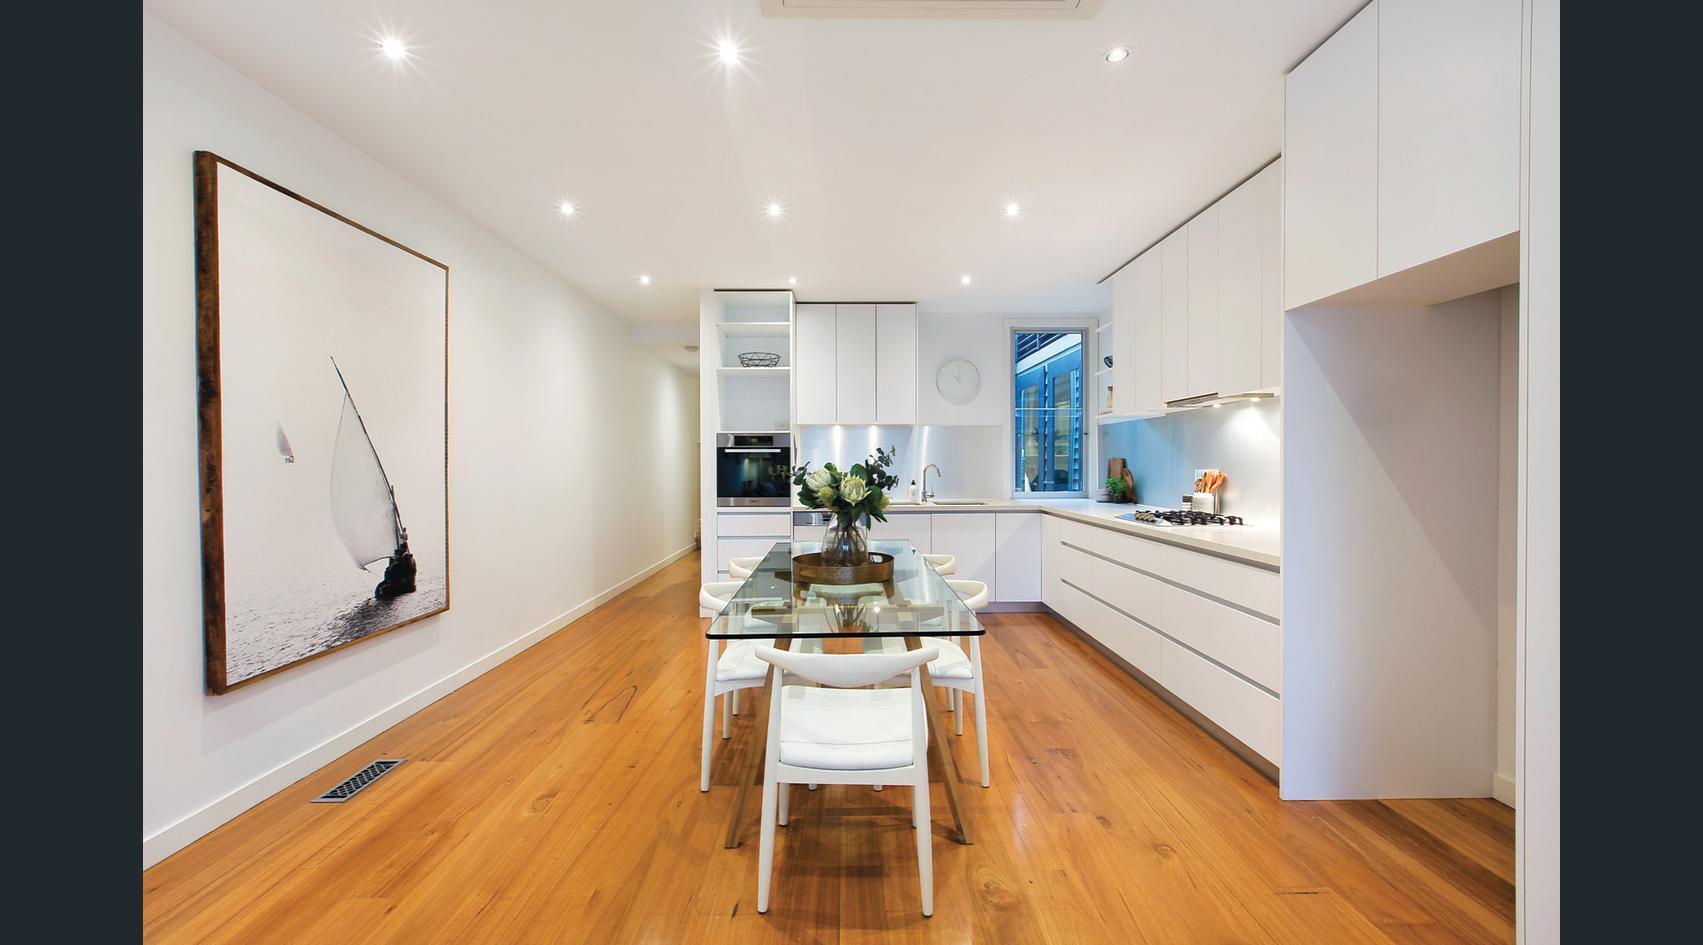 178-farrell-street-port-melbourne-student-accommodation-Melbourne-Kitchen-Area-Unilodgers